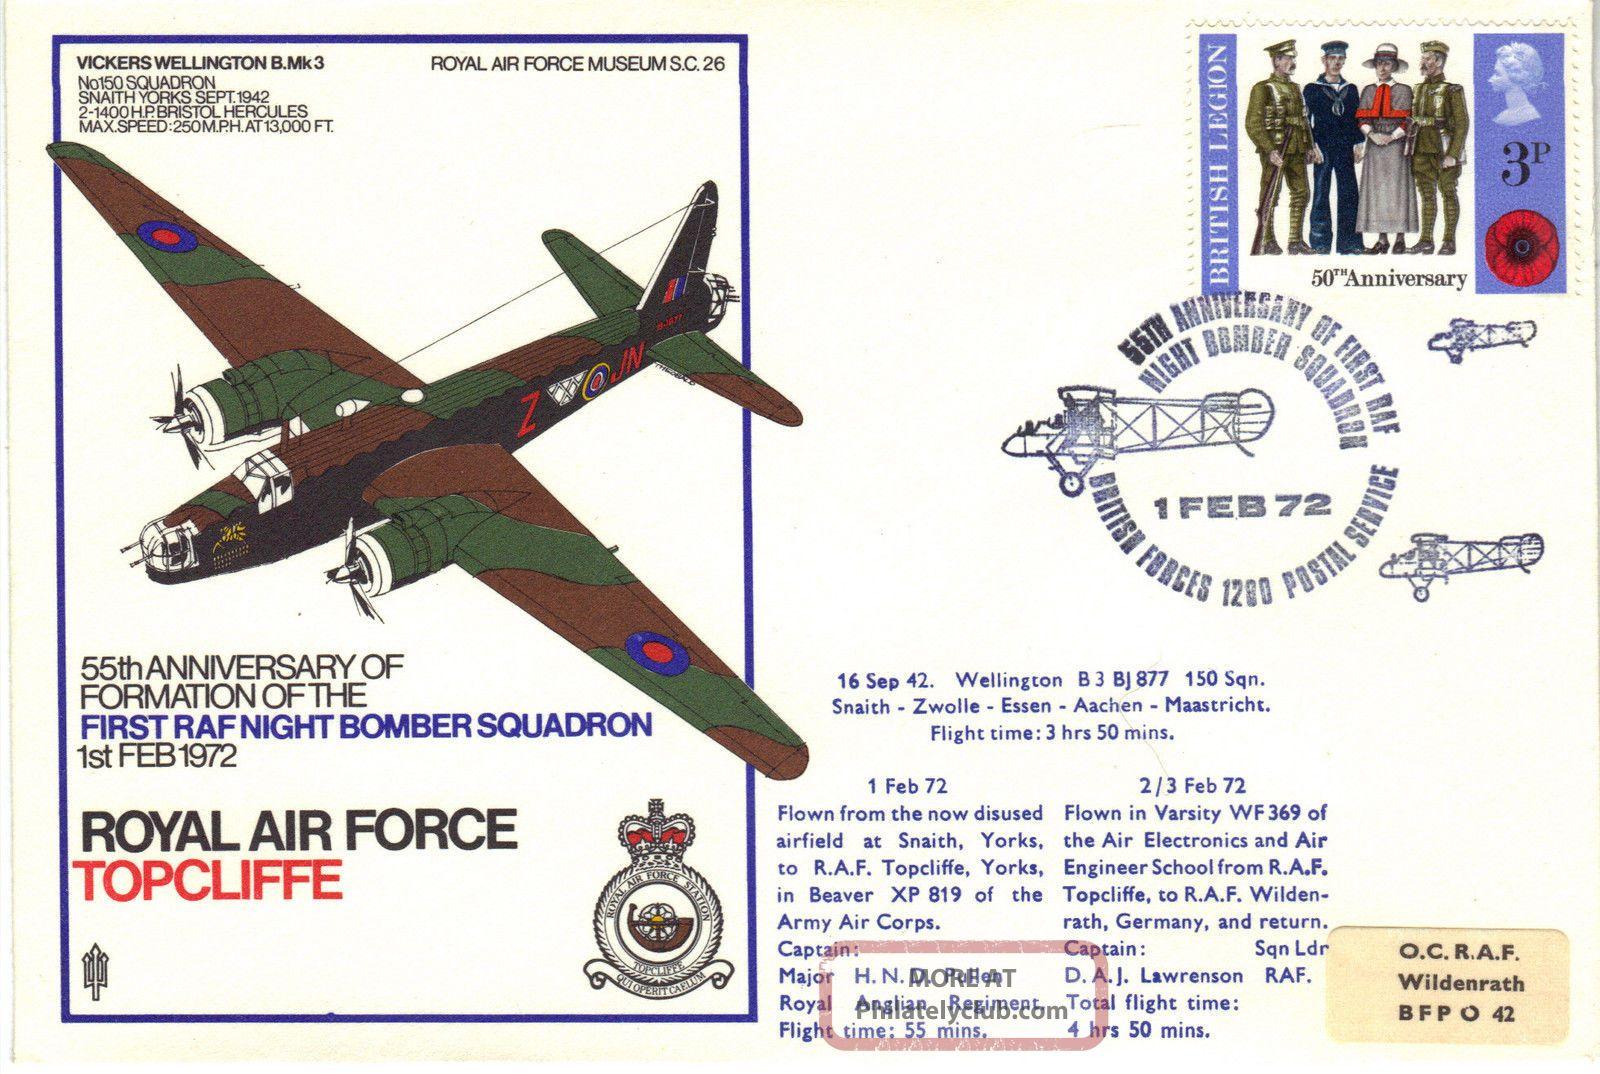 1972 Raf Sc26 55th Anniv 1st Raf Night Bomber Squadron Cover Topcliffe Ref:fp39 Transportation photo